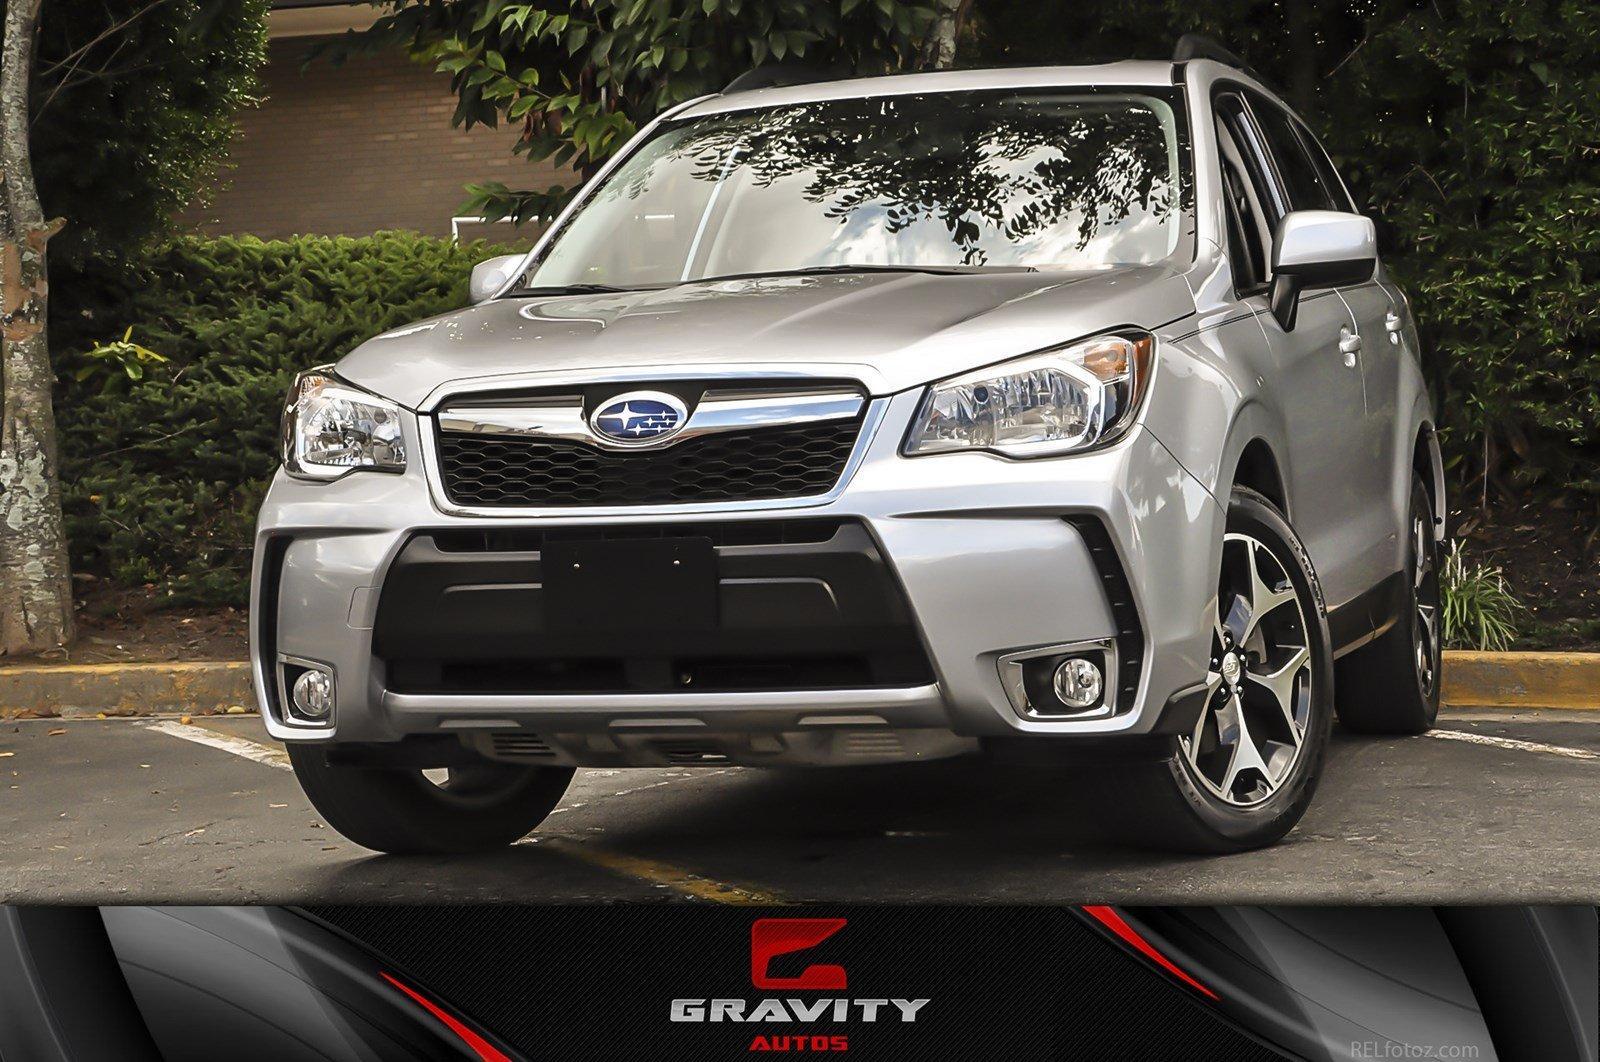 Subaru Forester 2.0 Xt Premium >> 2015 Subaru Forester Forester 2 0xt Premium Stock 818406